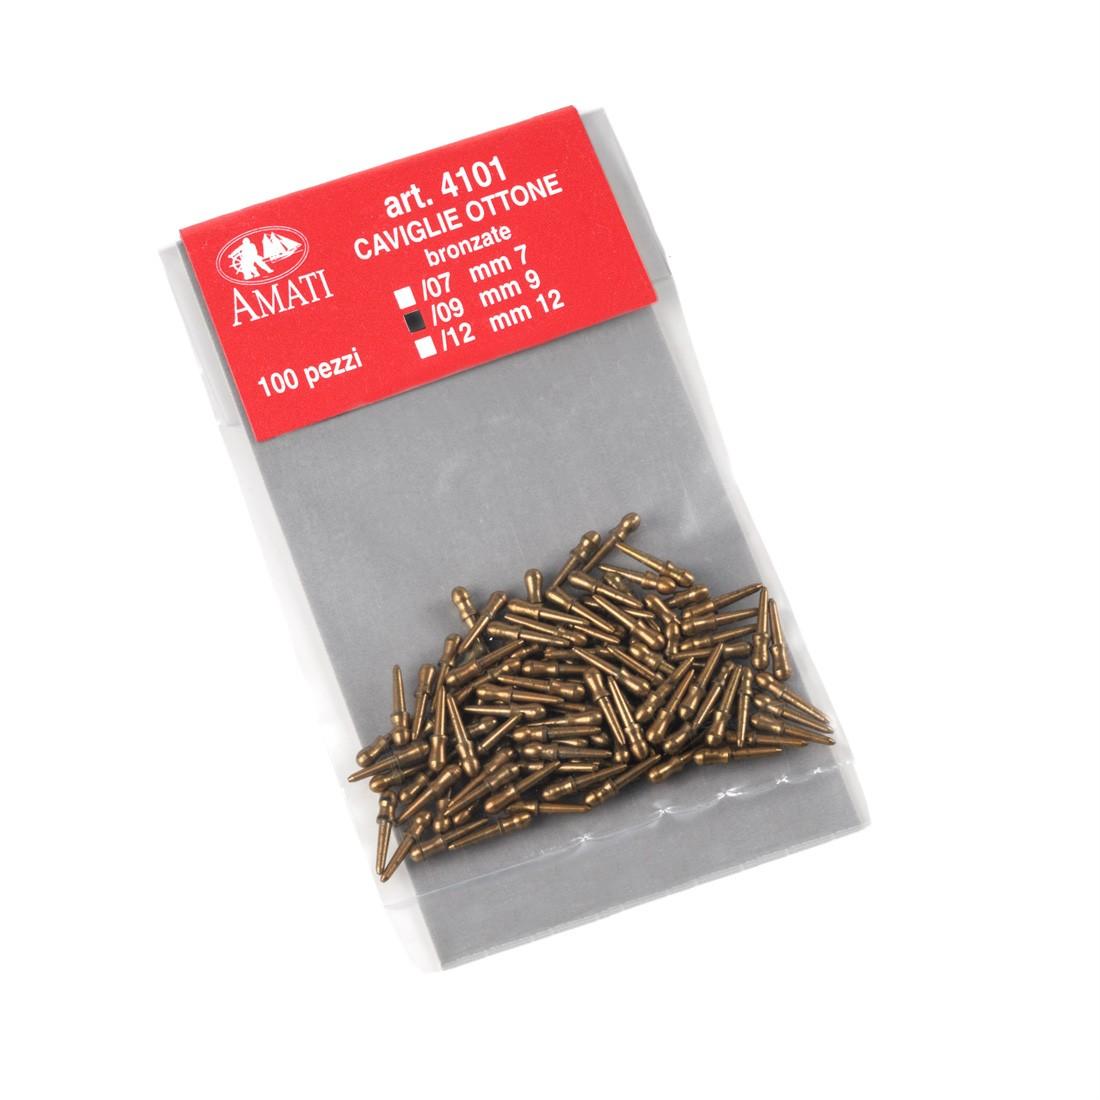 Bronzed brass belaying pins mm.9